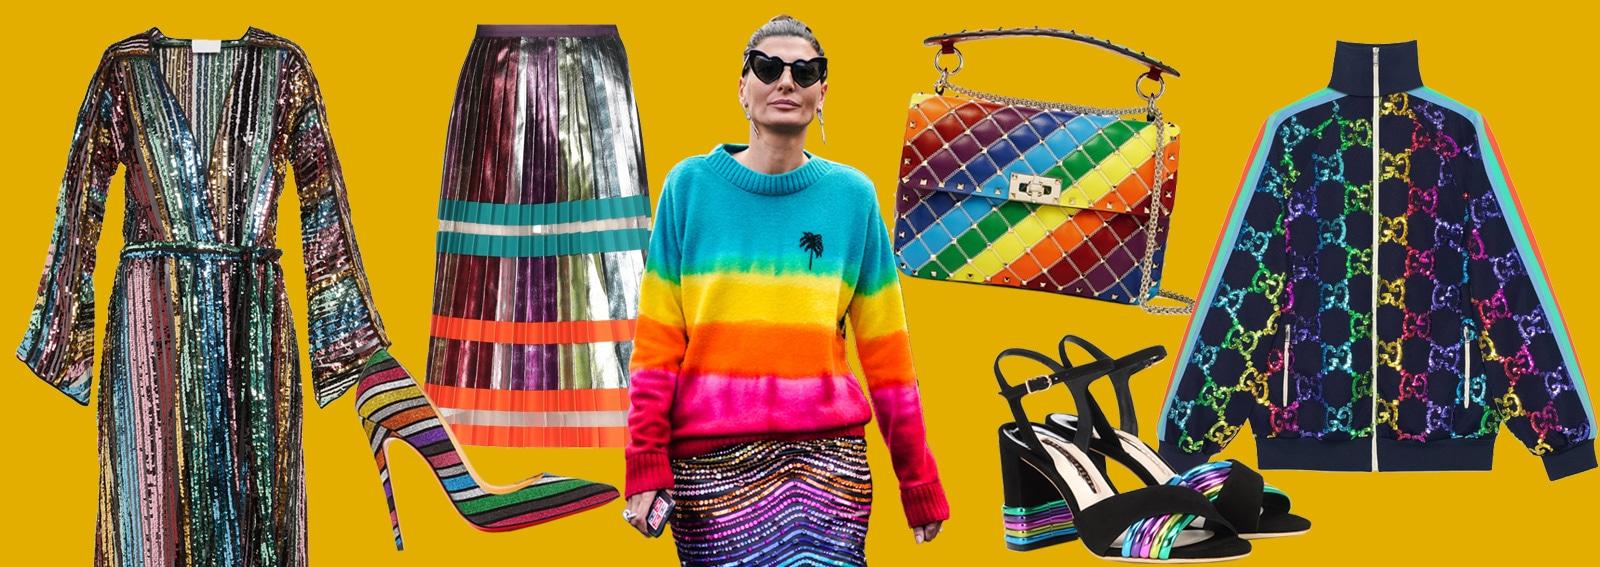 DESKTOP_rainbow